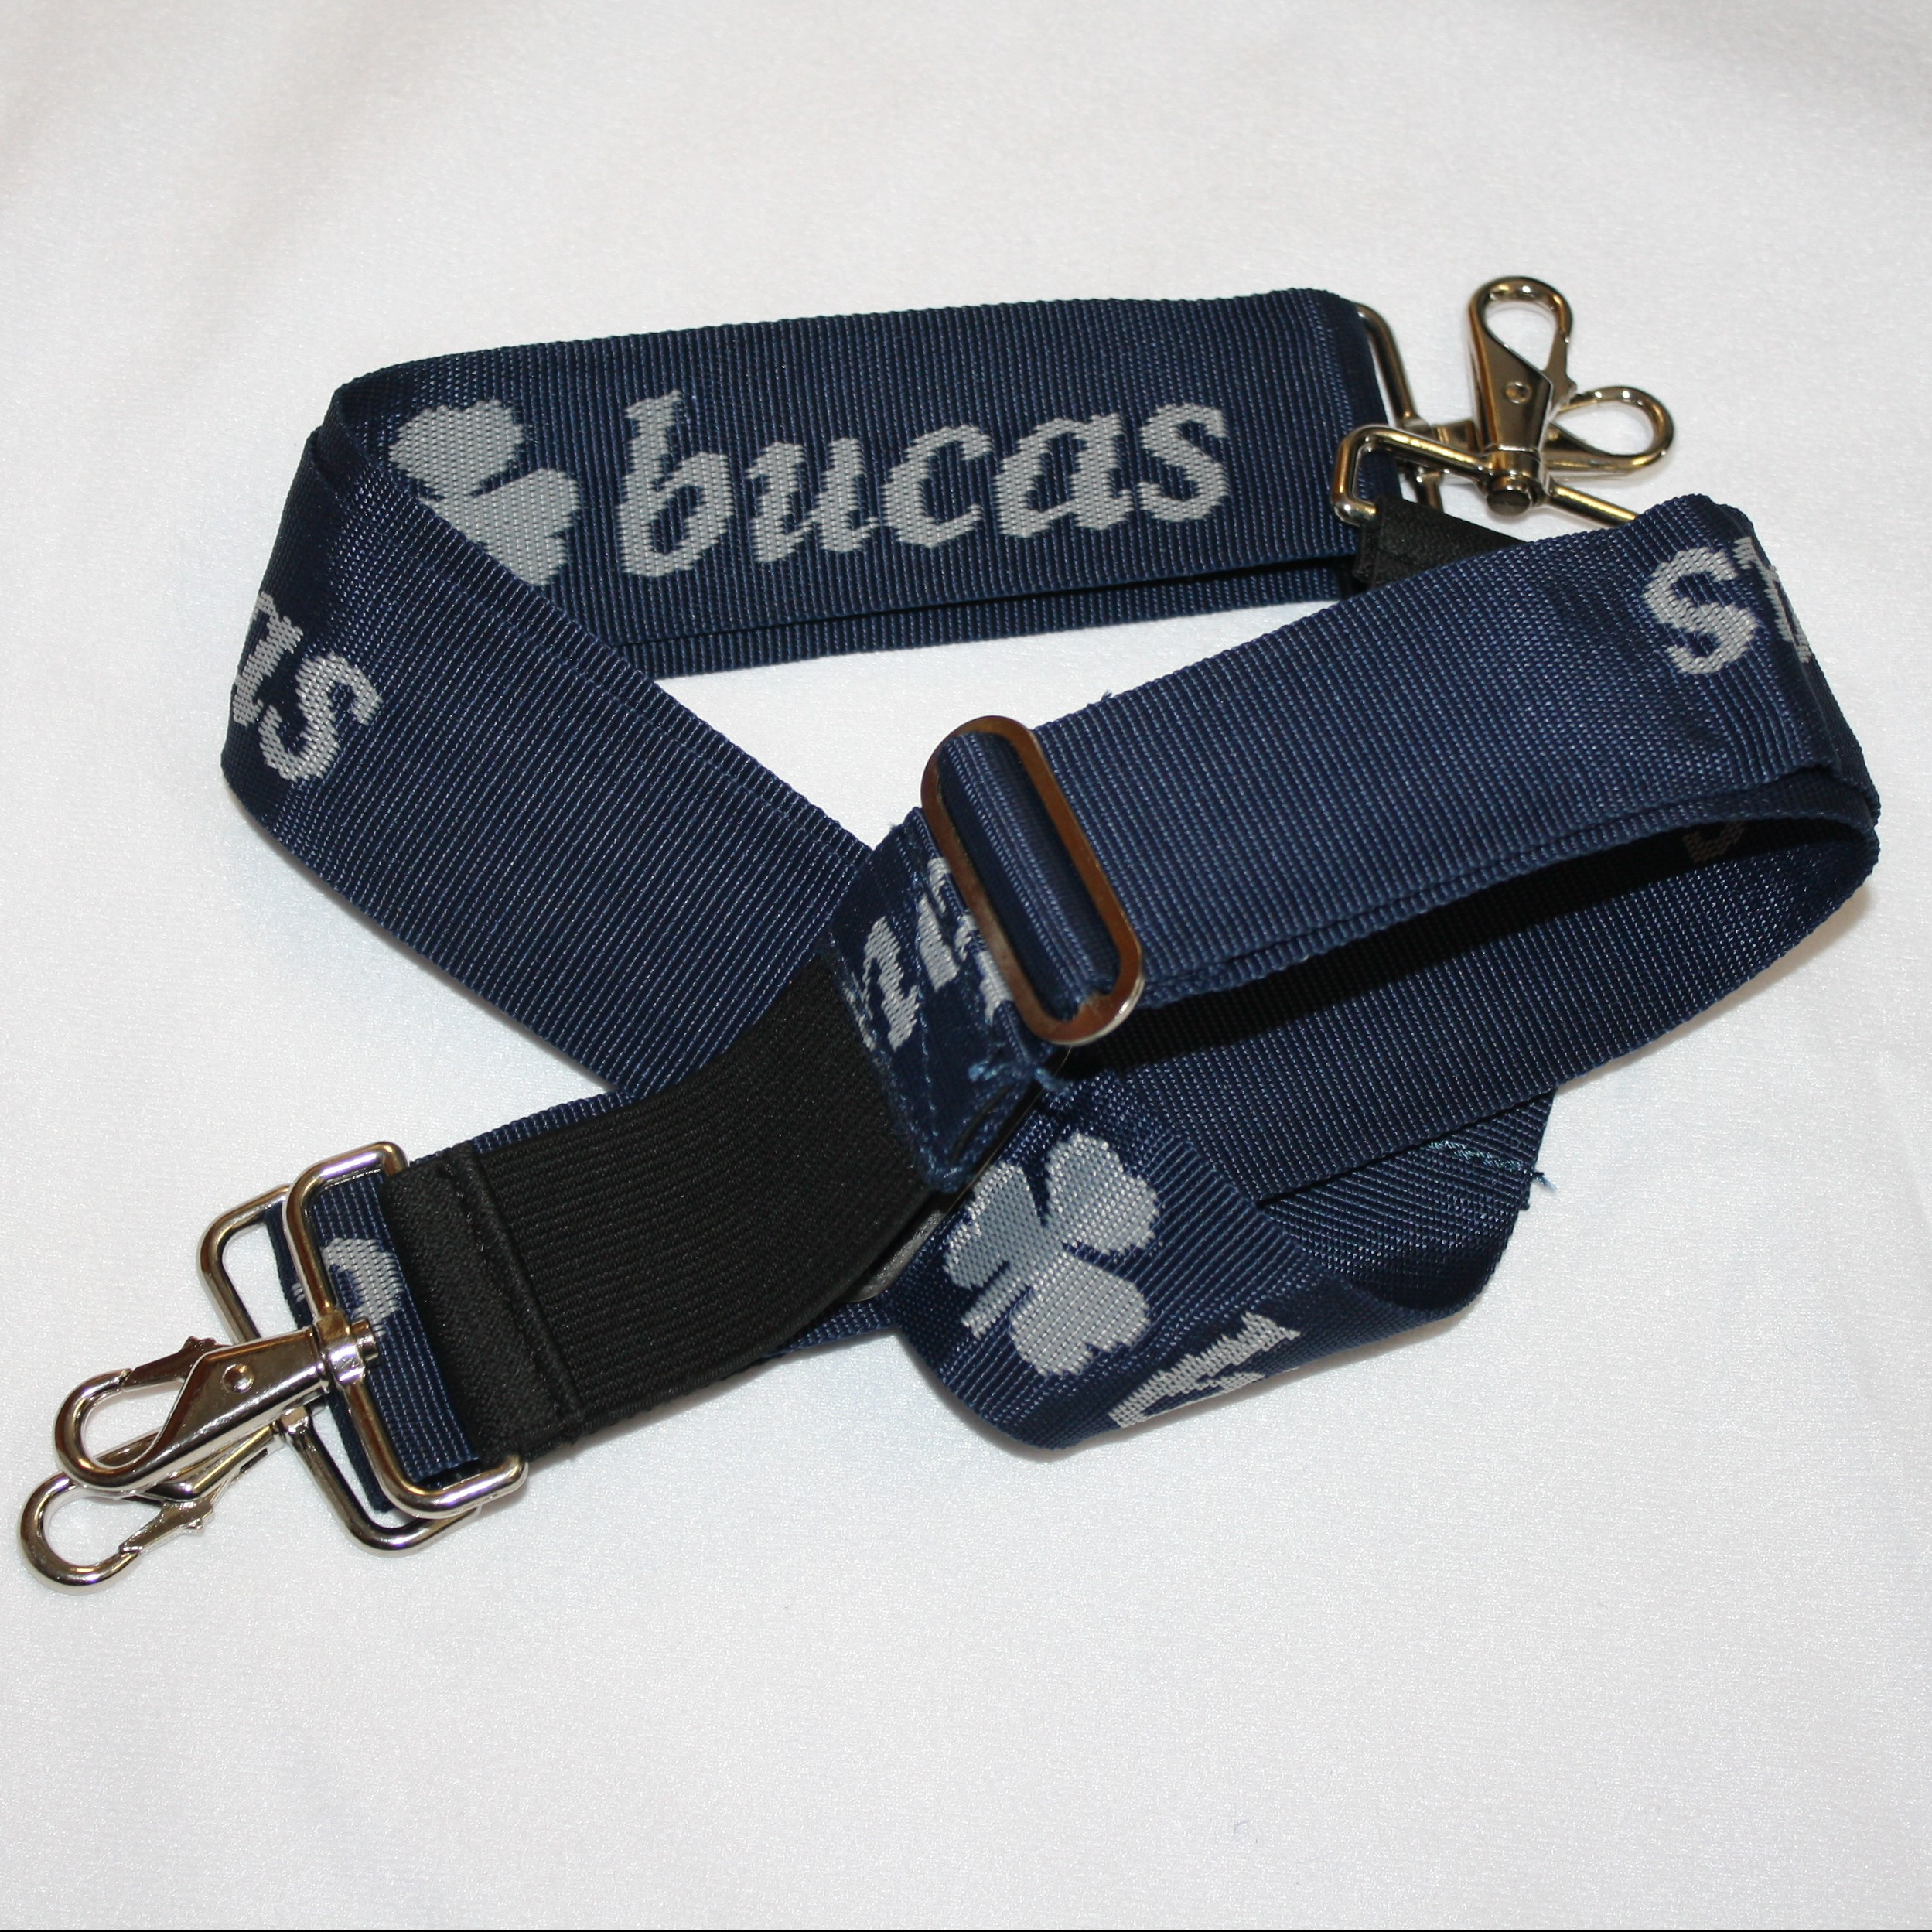 Bucas Belly Pad Extender Strap pairs Navy